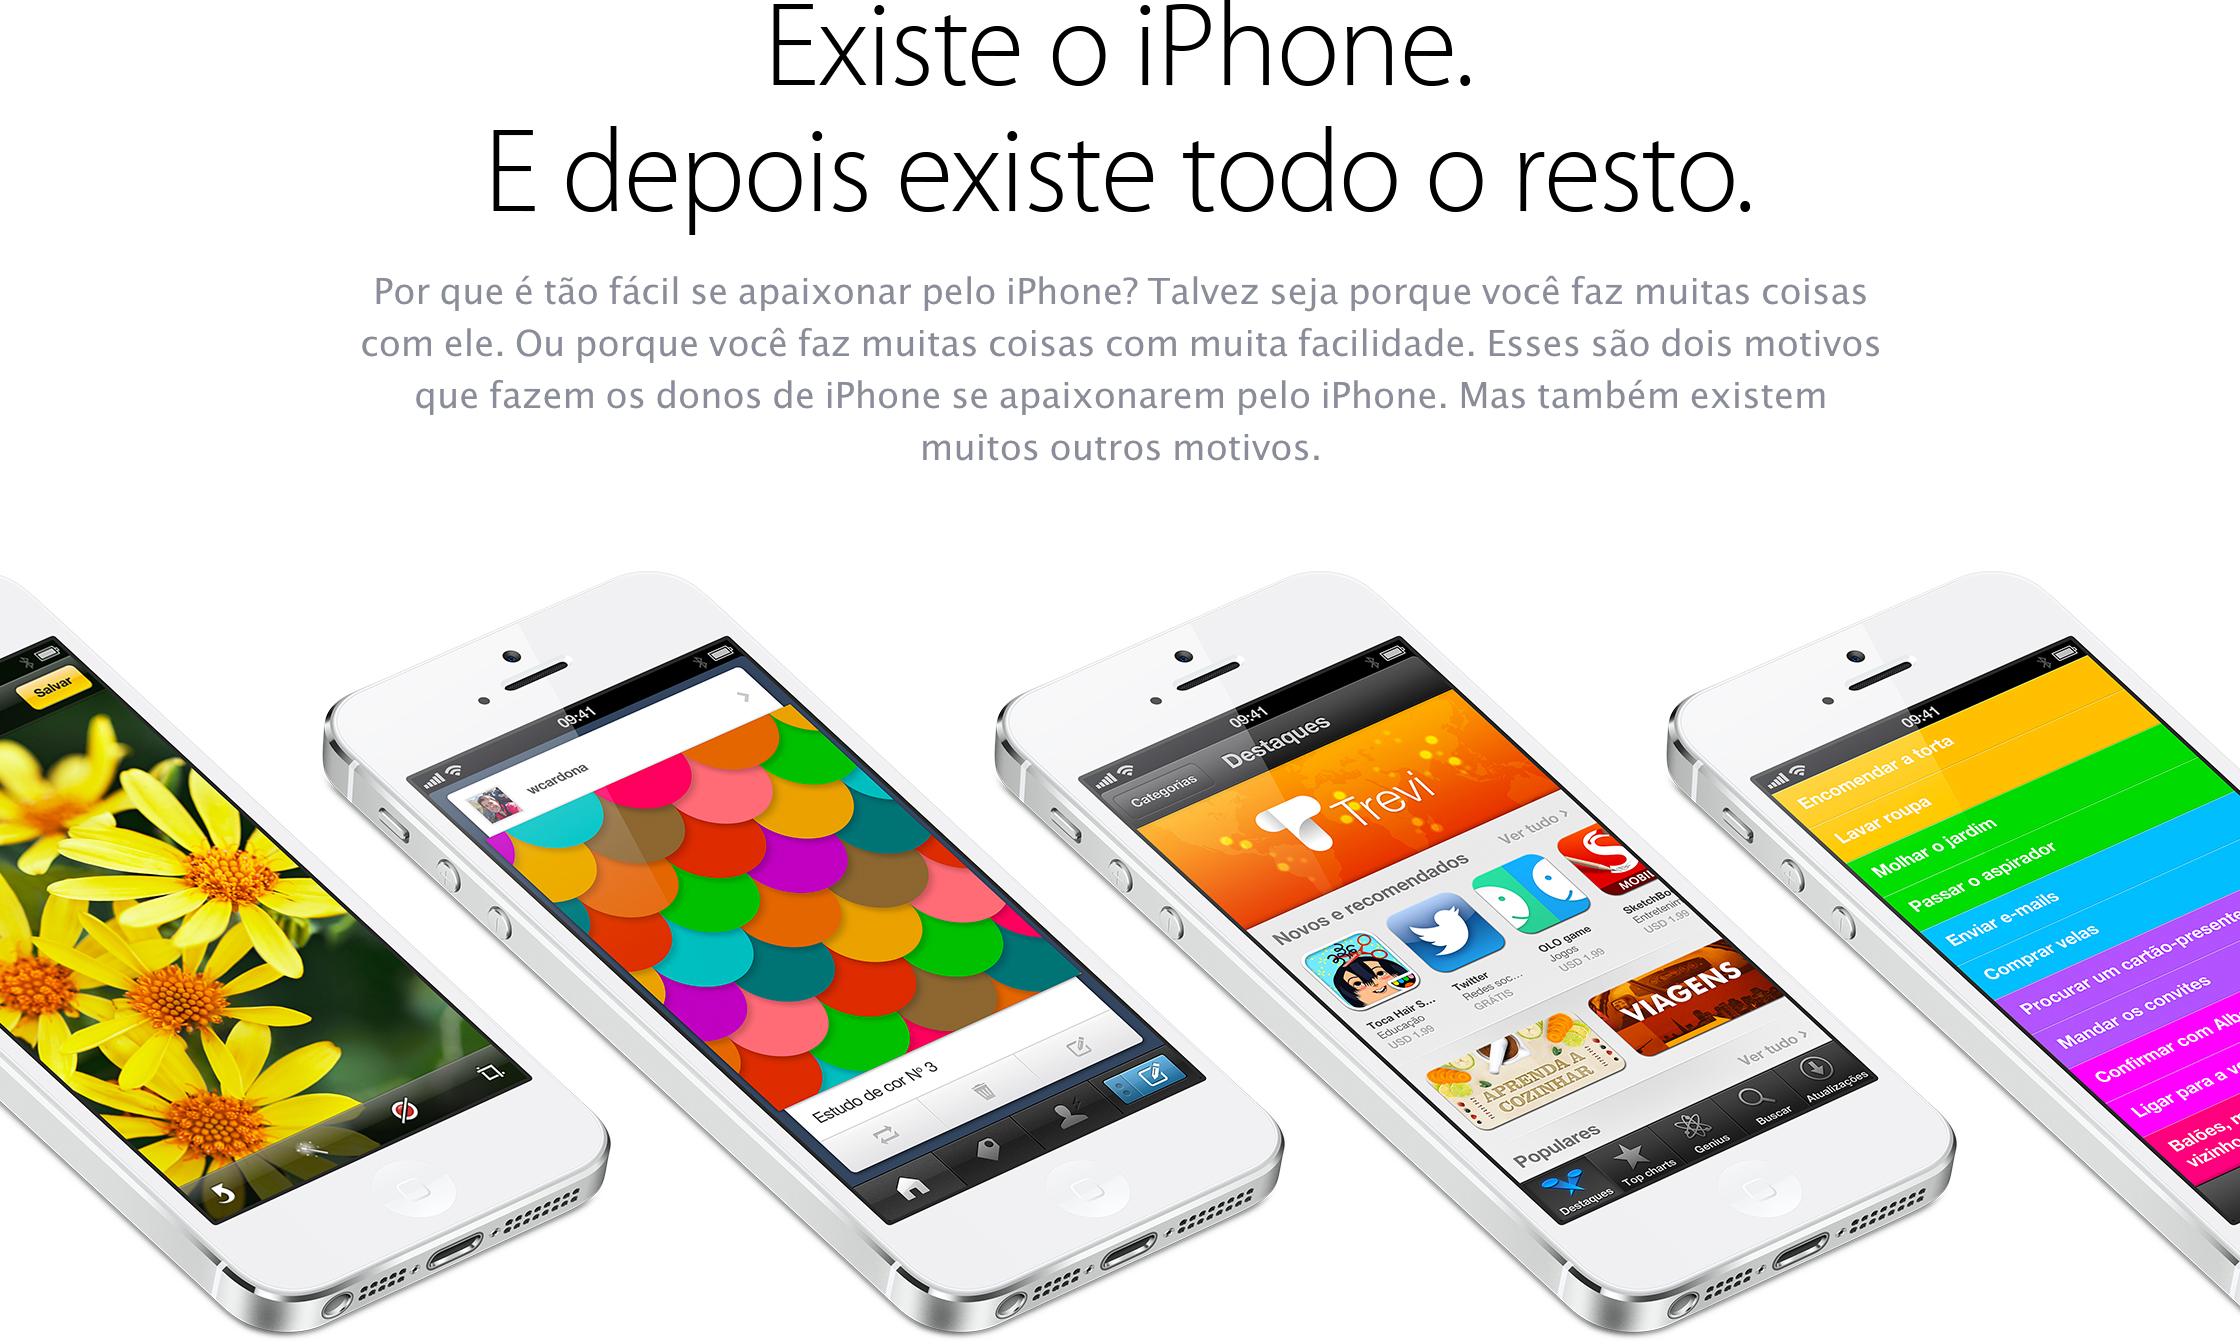 Apple - Existe o iPhone. E depois existe todo o resto.